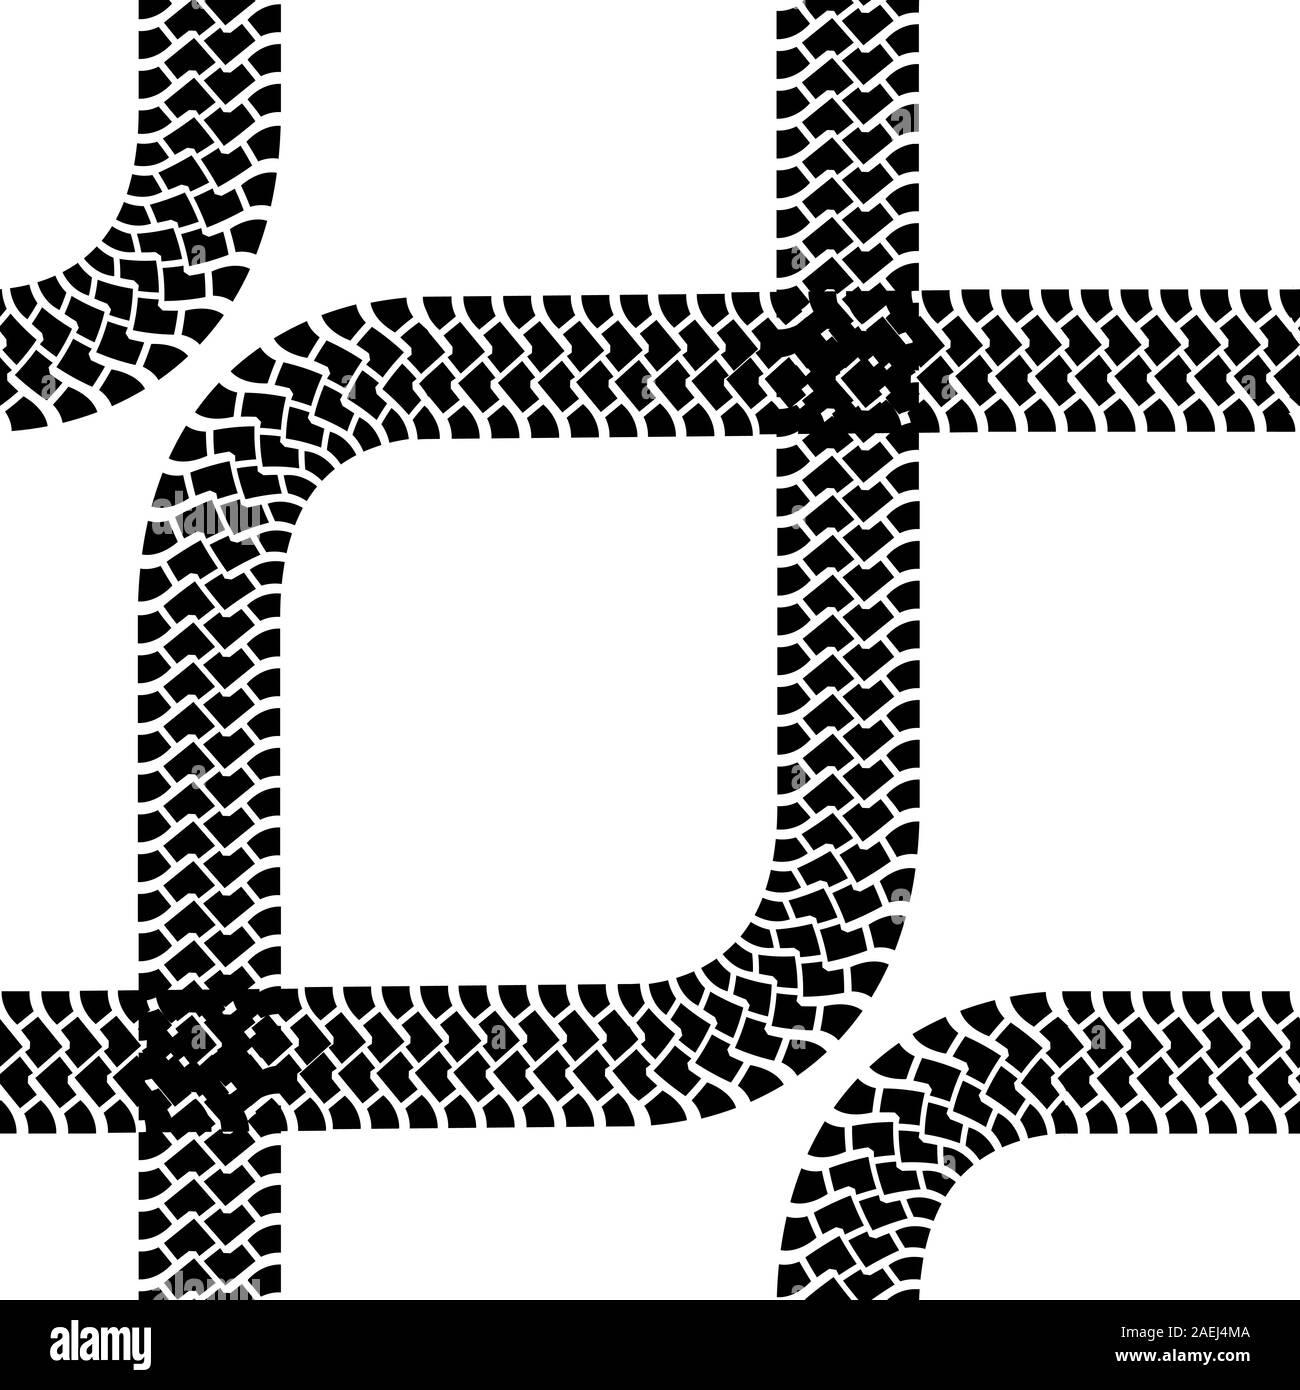 Seamless wallpaper tire tracks pattern illustration vector background Stock Vector